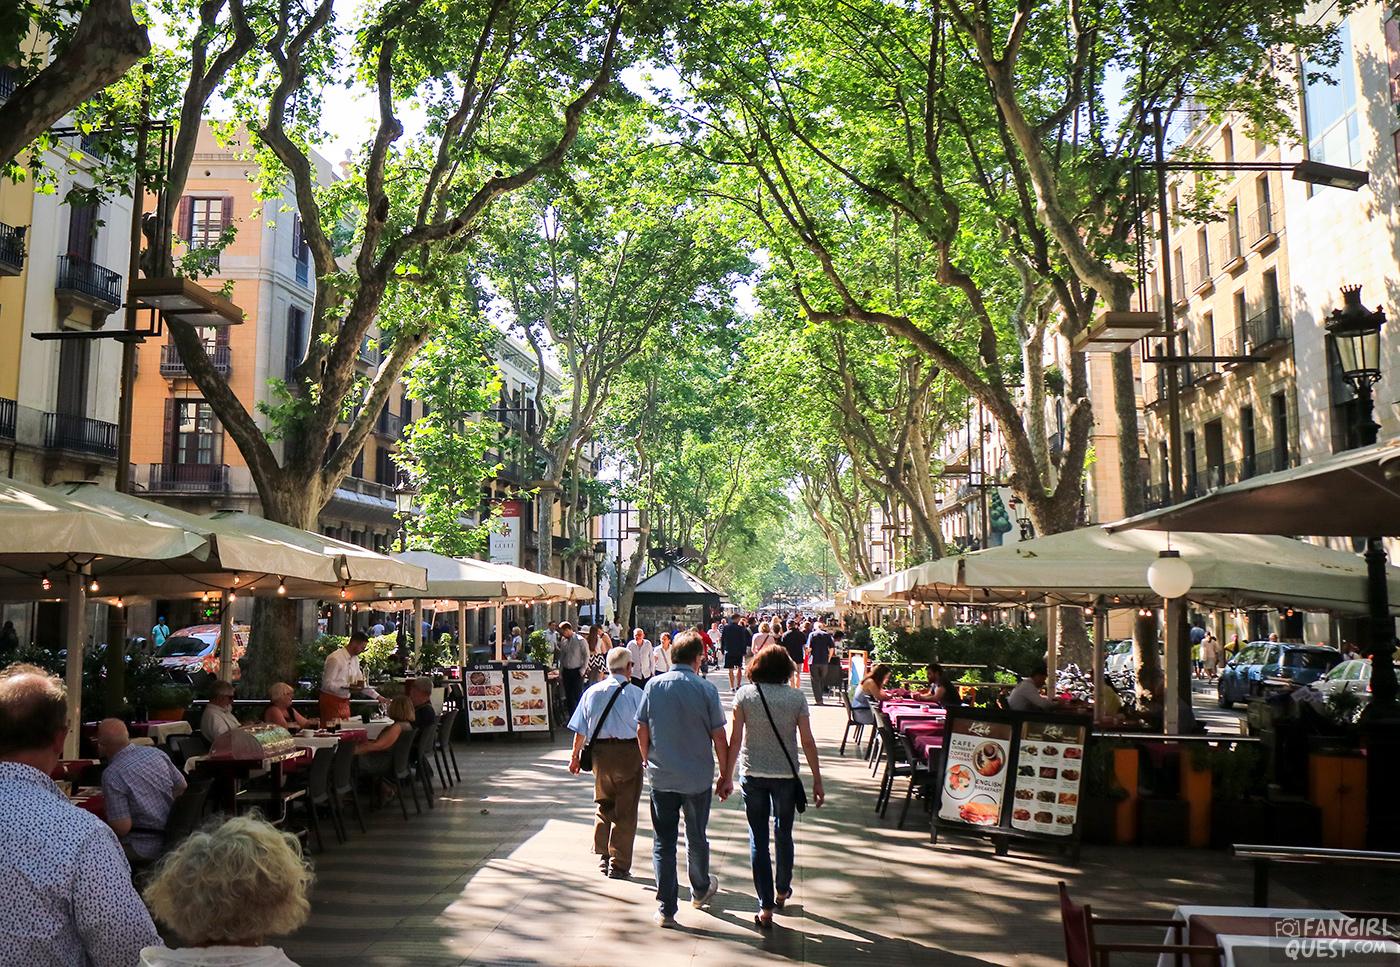 la-rambla-shopping-street-7676.jpg